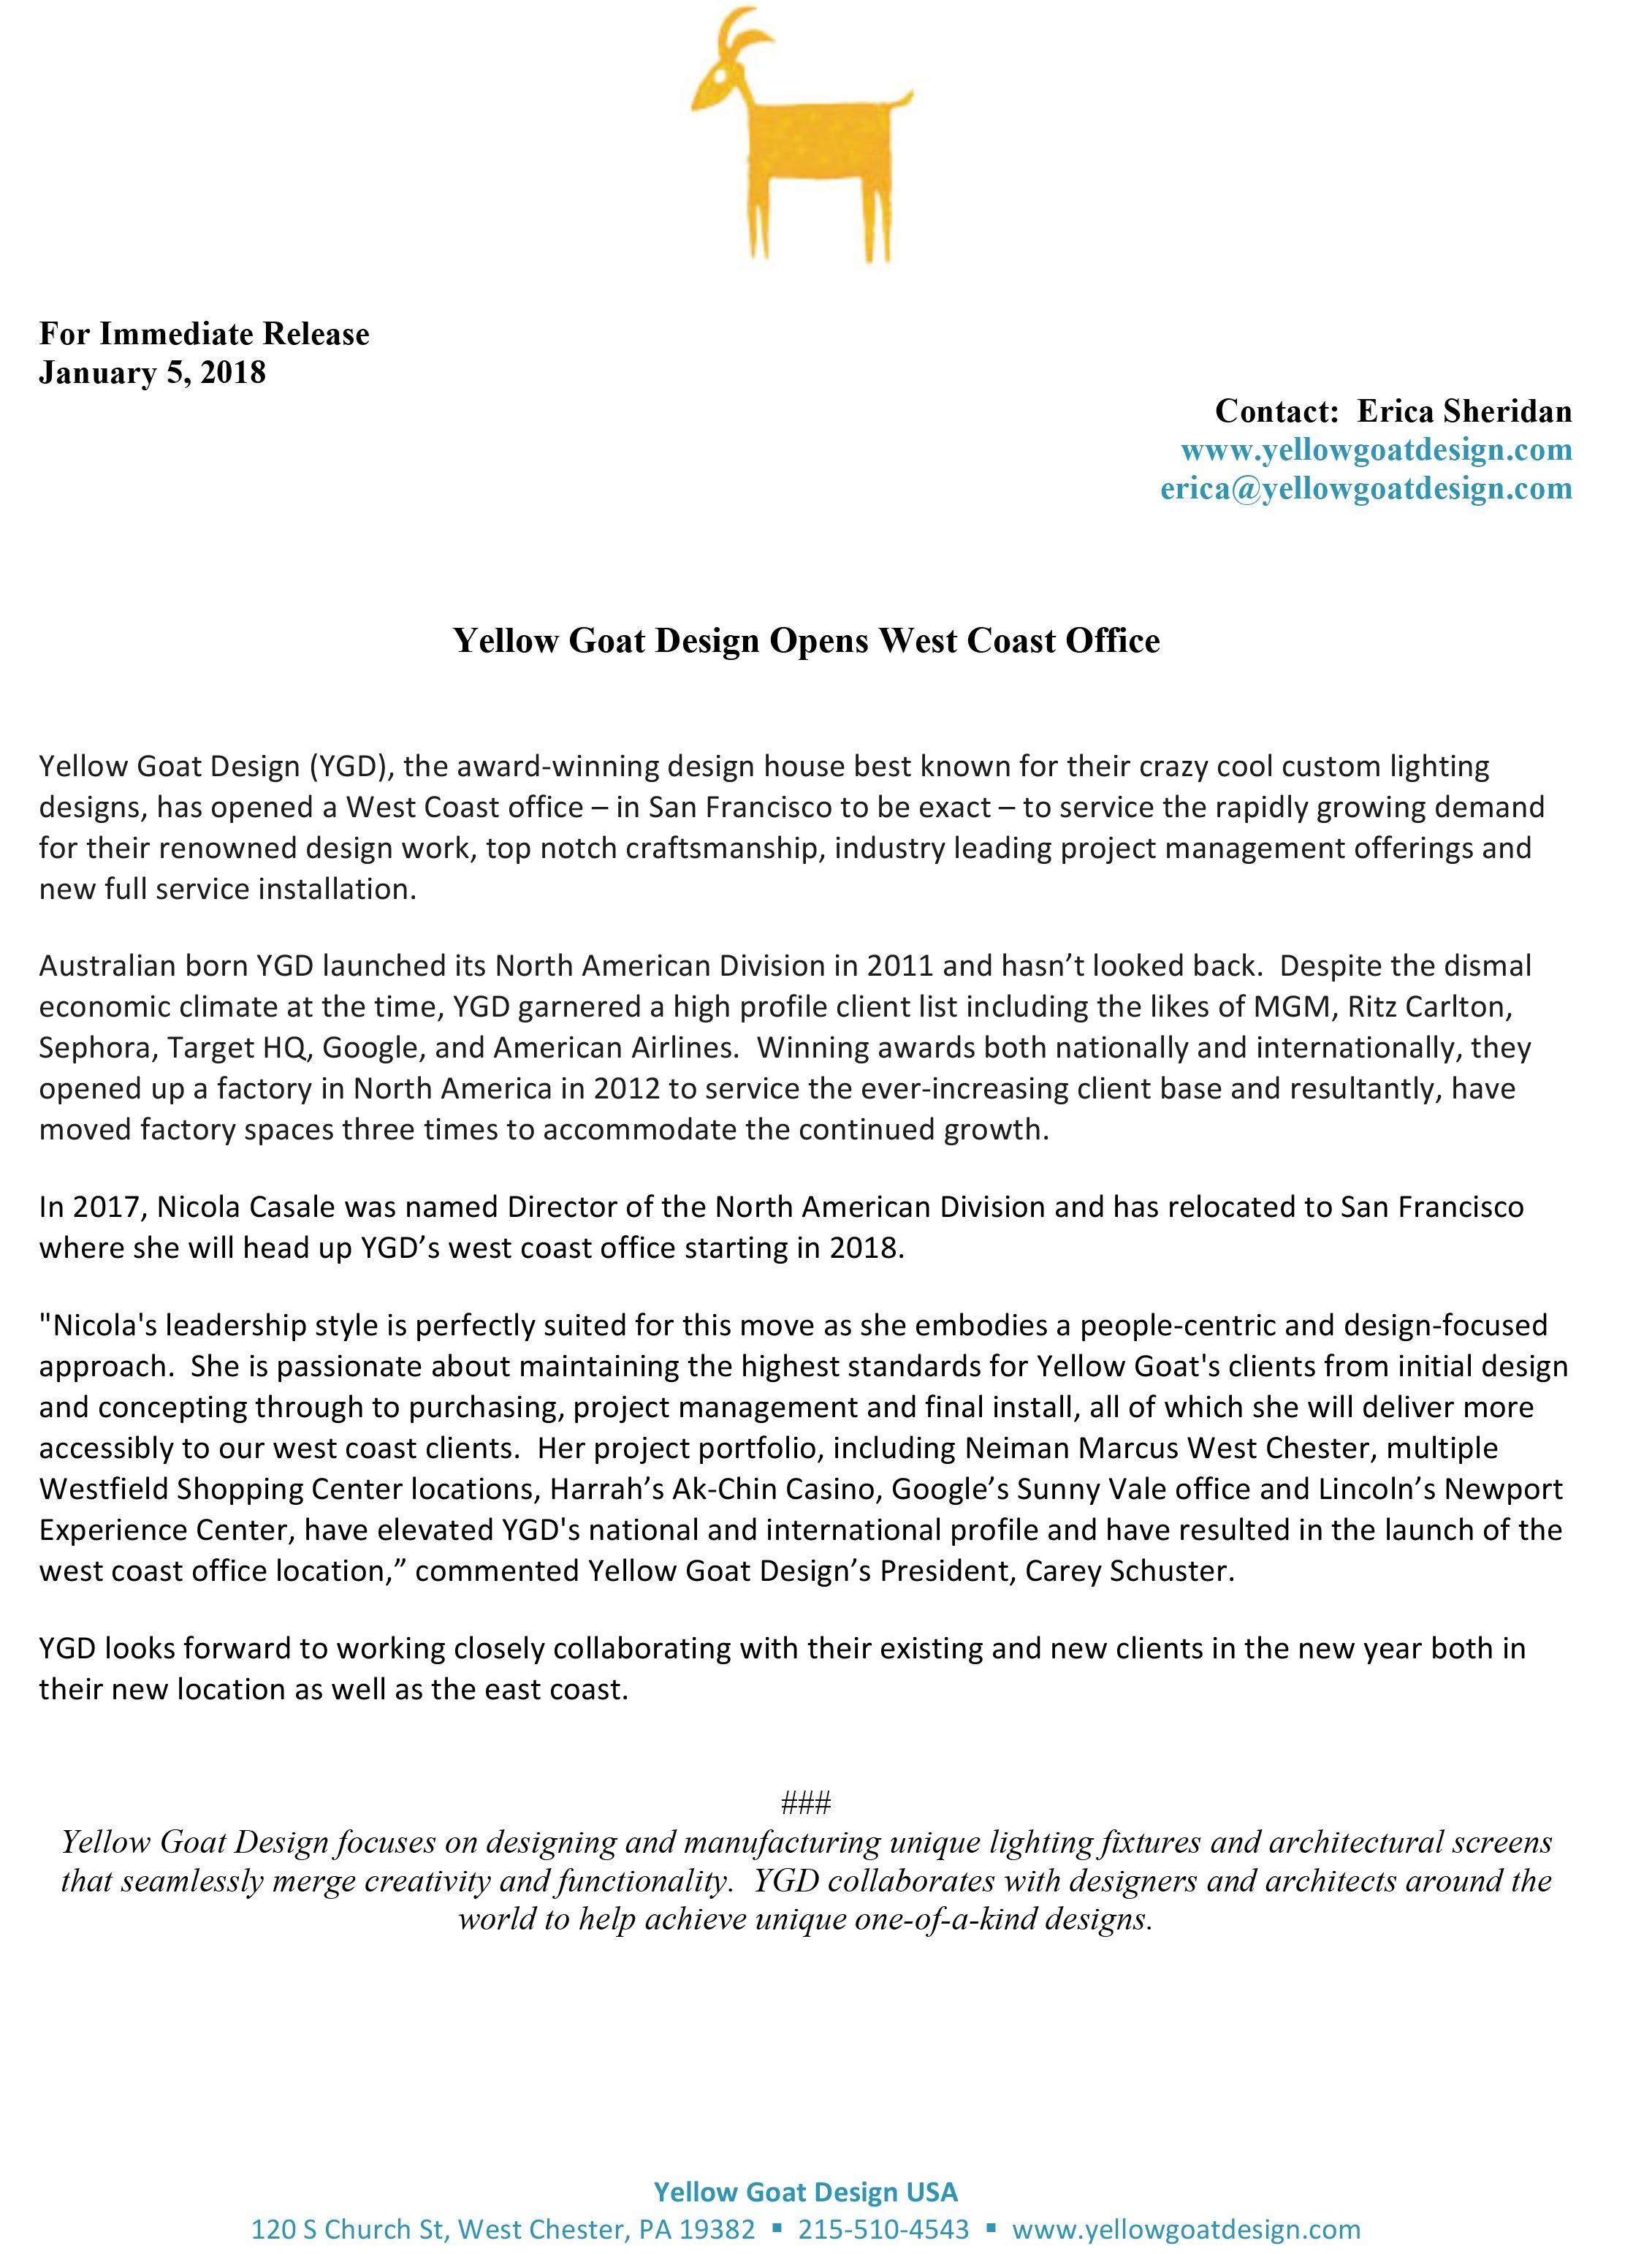 YGD Opens West Coast Office.jpg